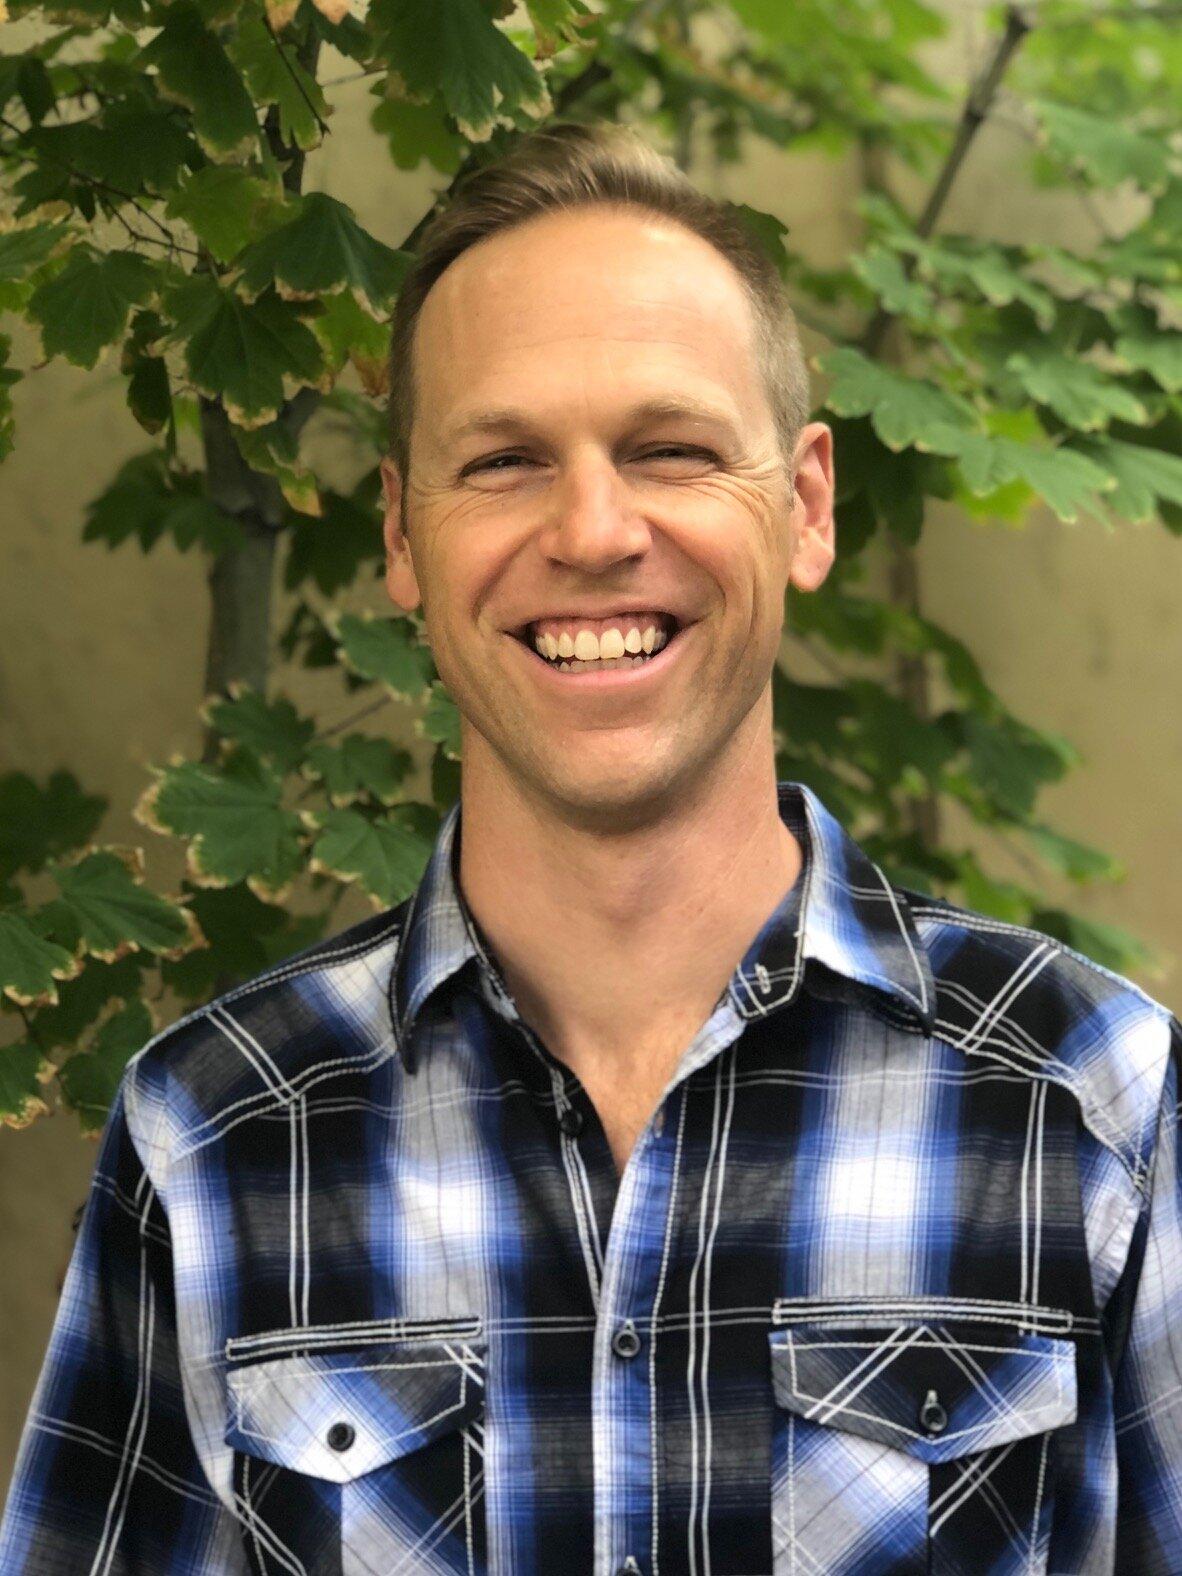 Mike Smiling.jpg